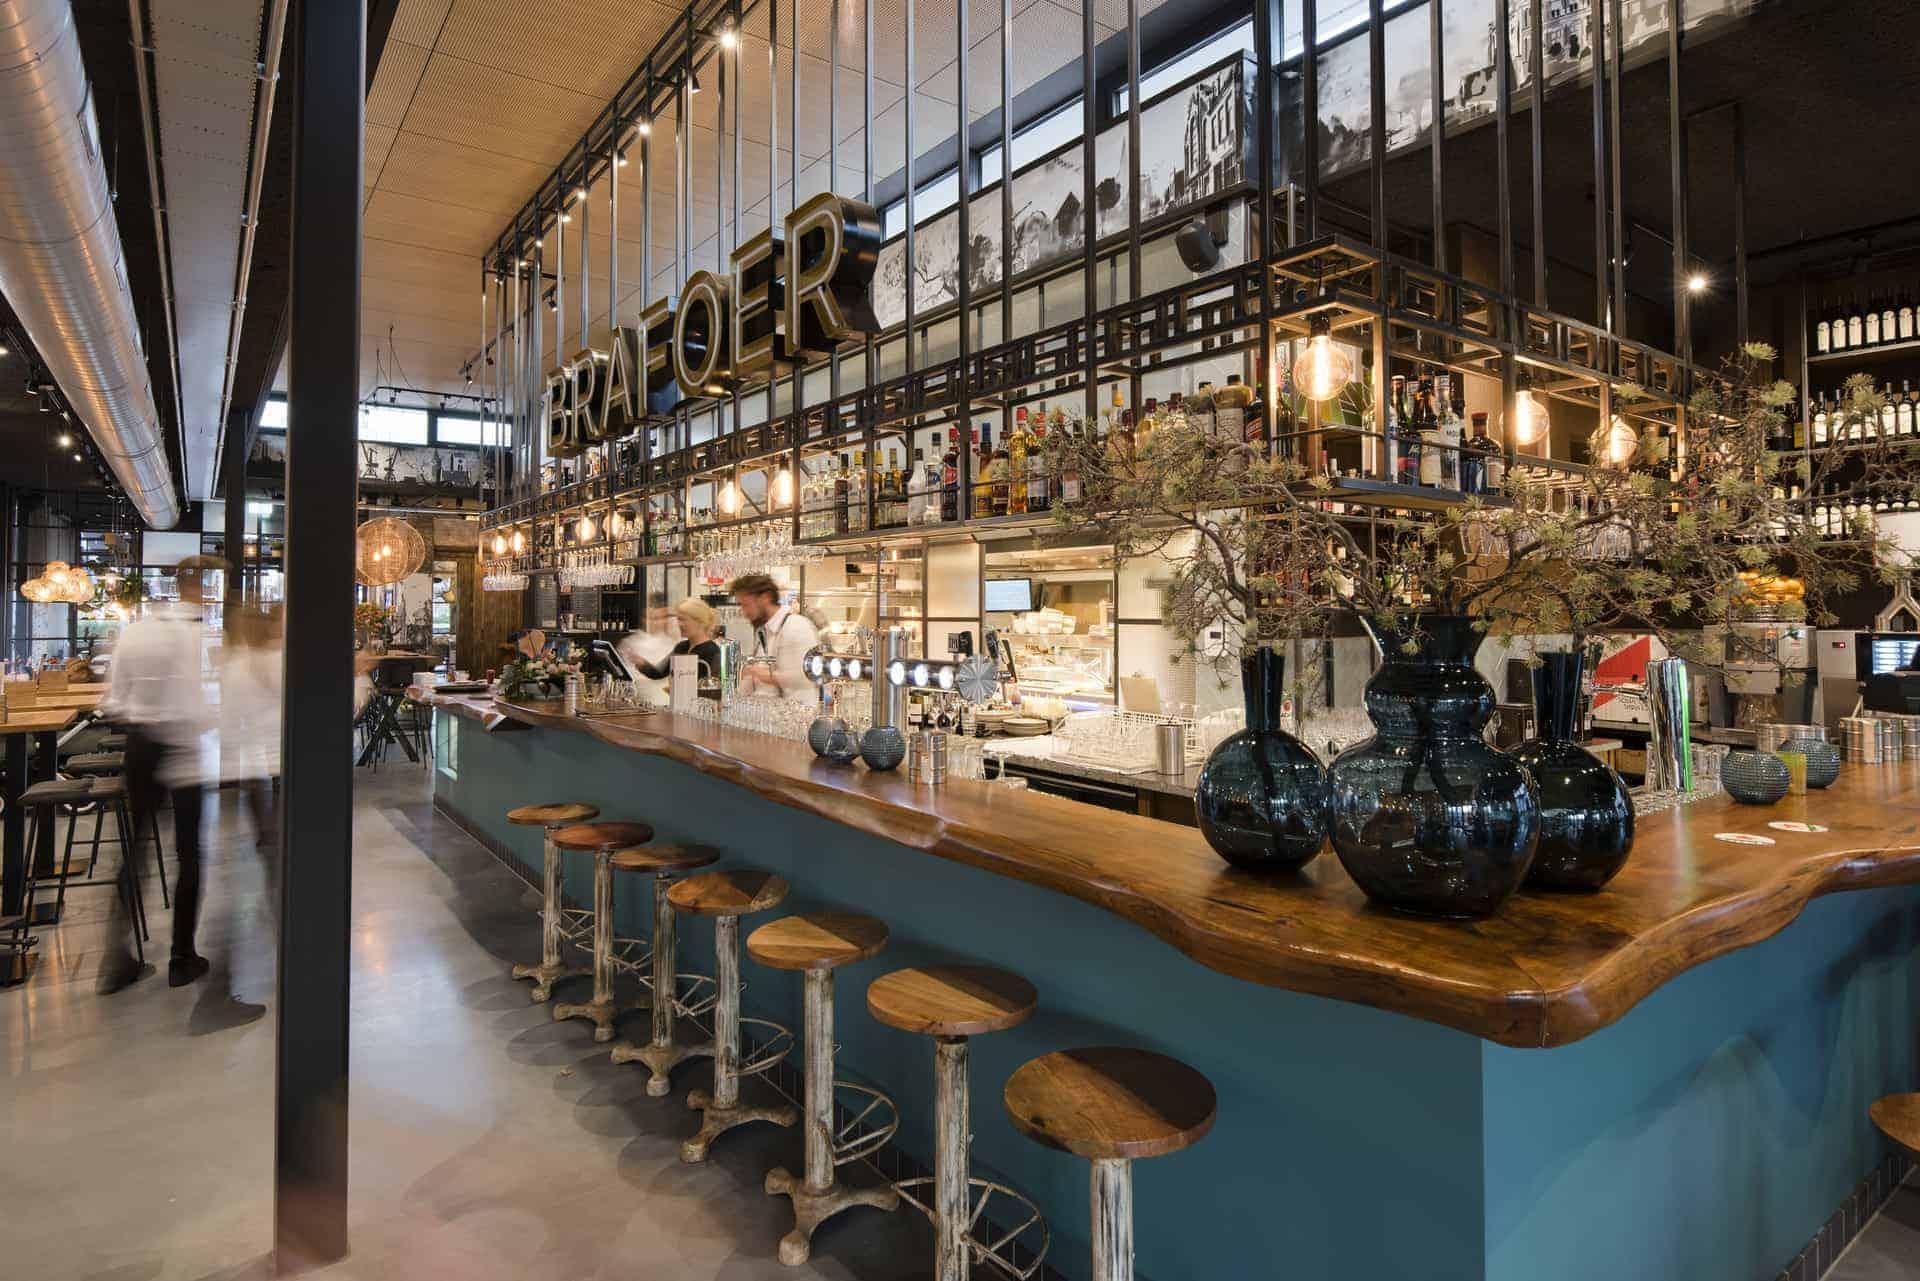 Grand Café Brafoer geopend!